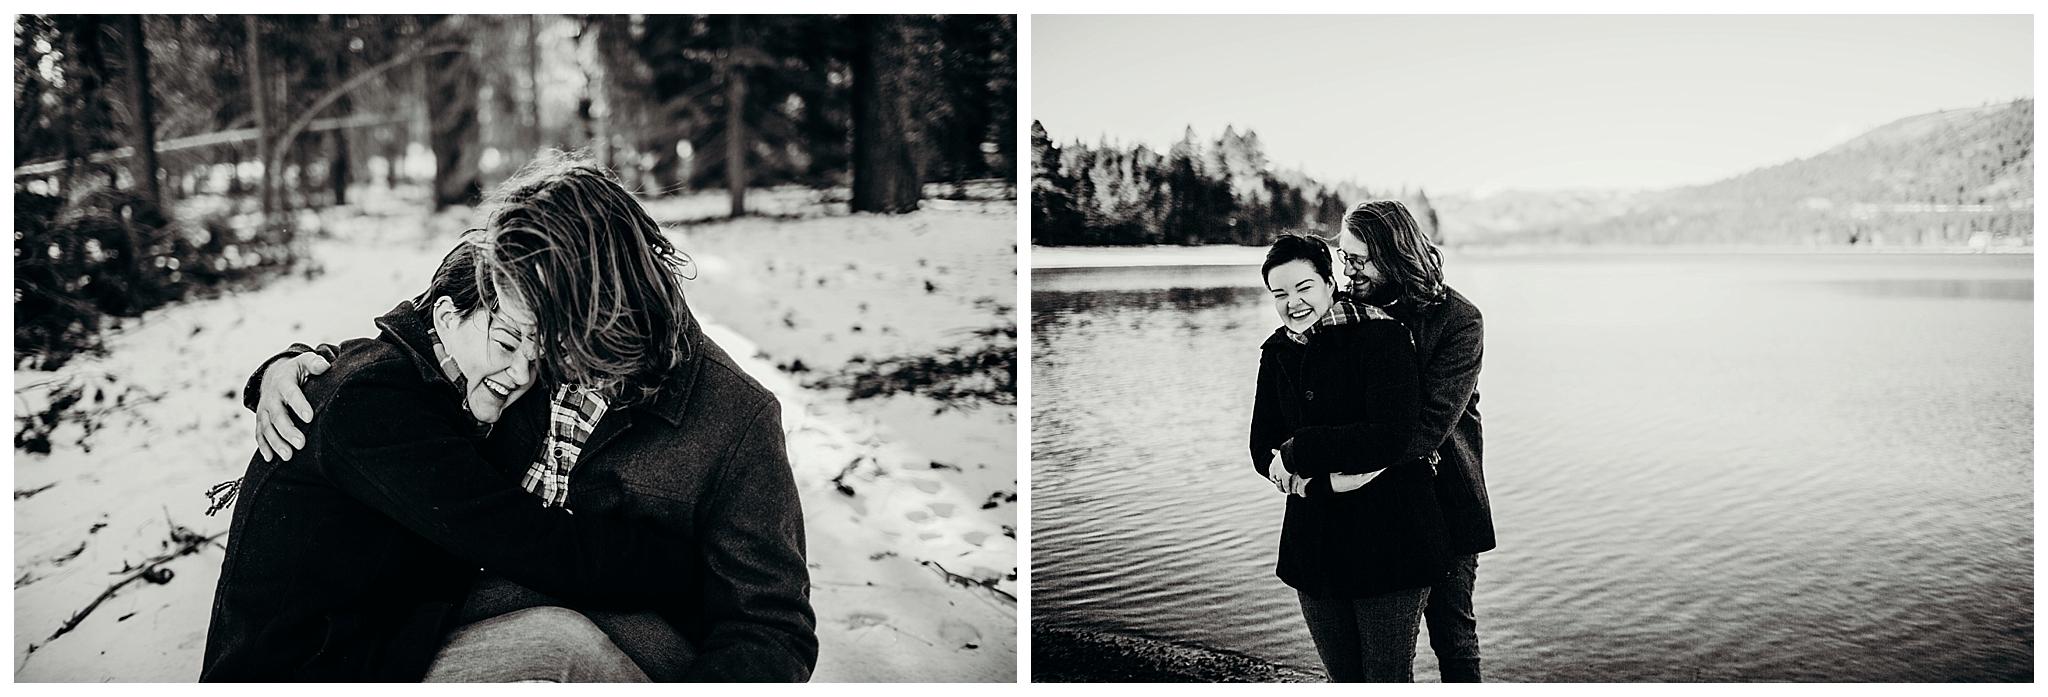 reno-tahoe-truckee-lifestyle-engagement-elopemet-wedding-photographer-6.jpg